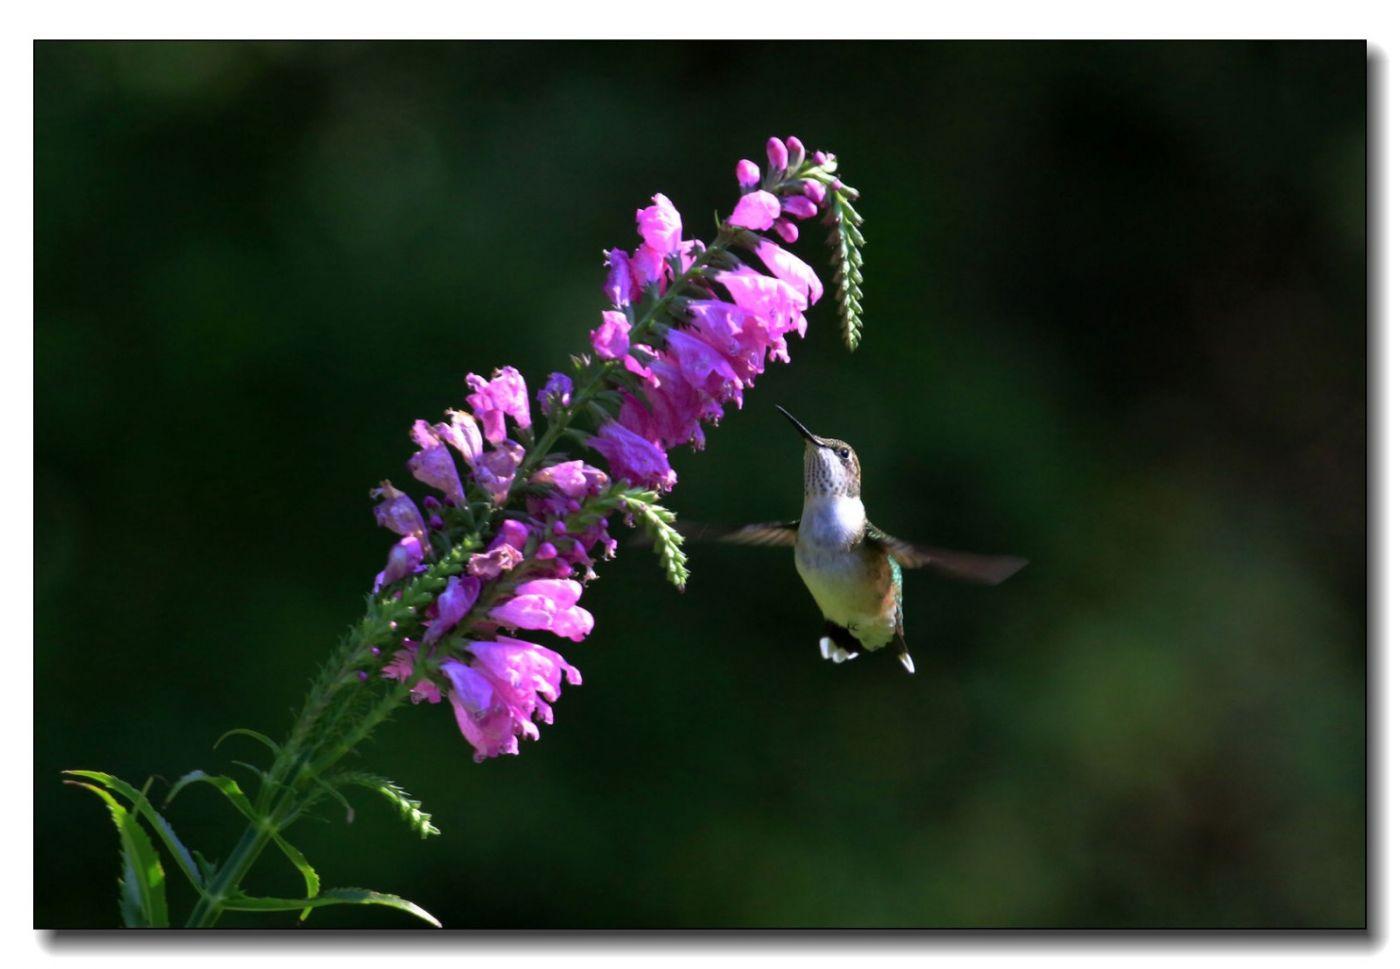 蜂鸟组图(五)_图1-2